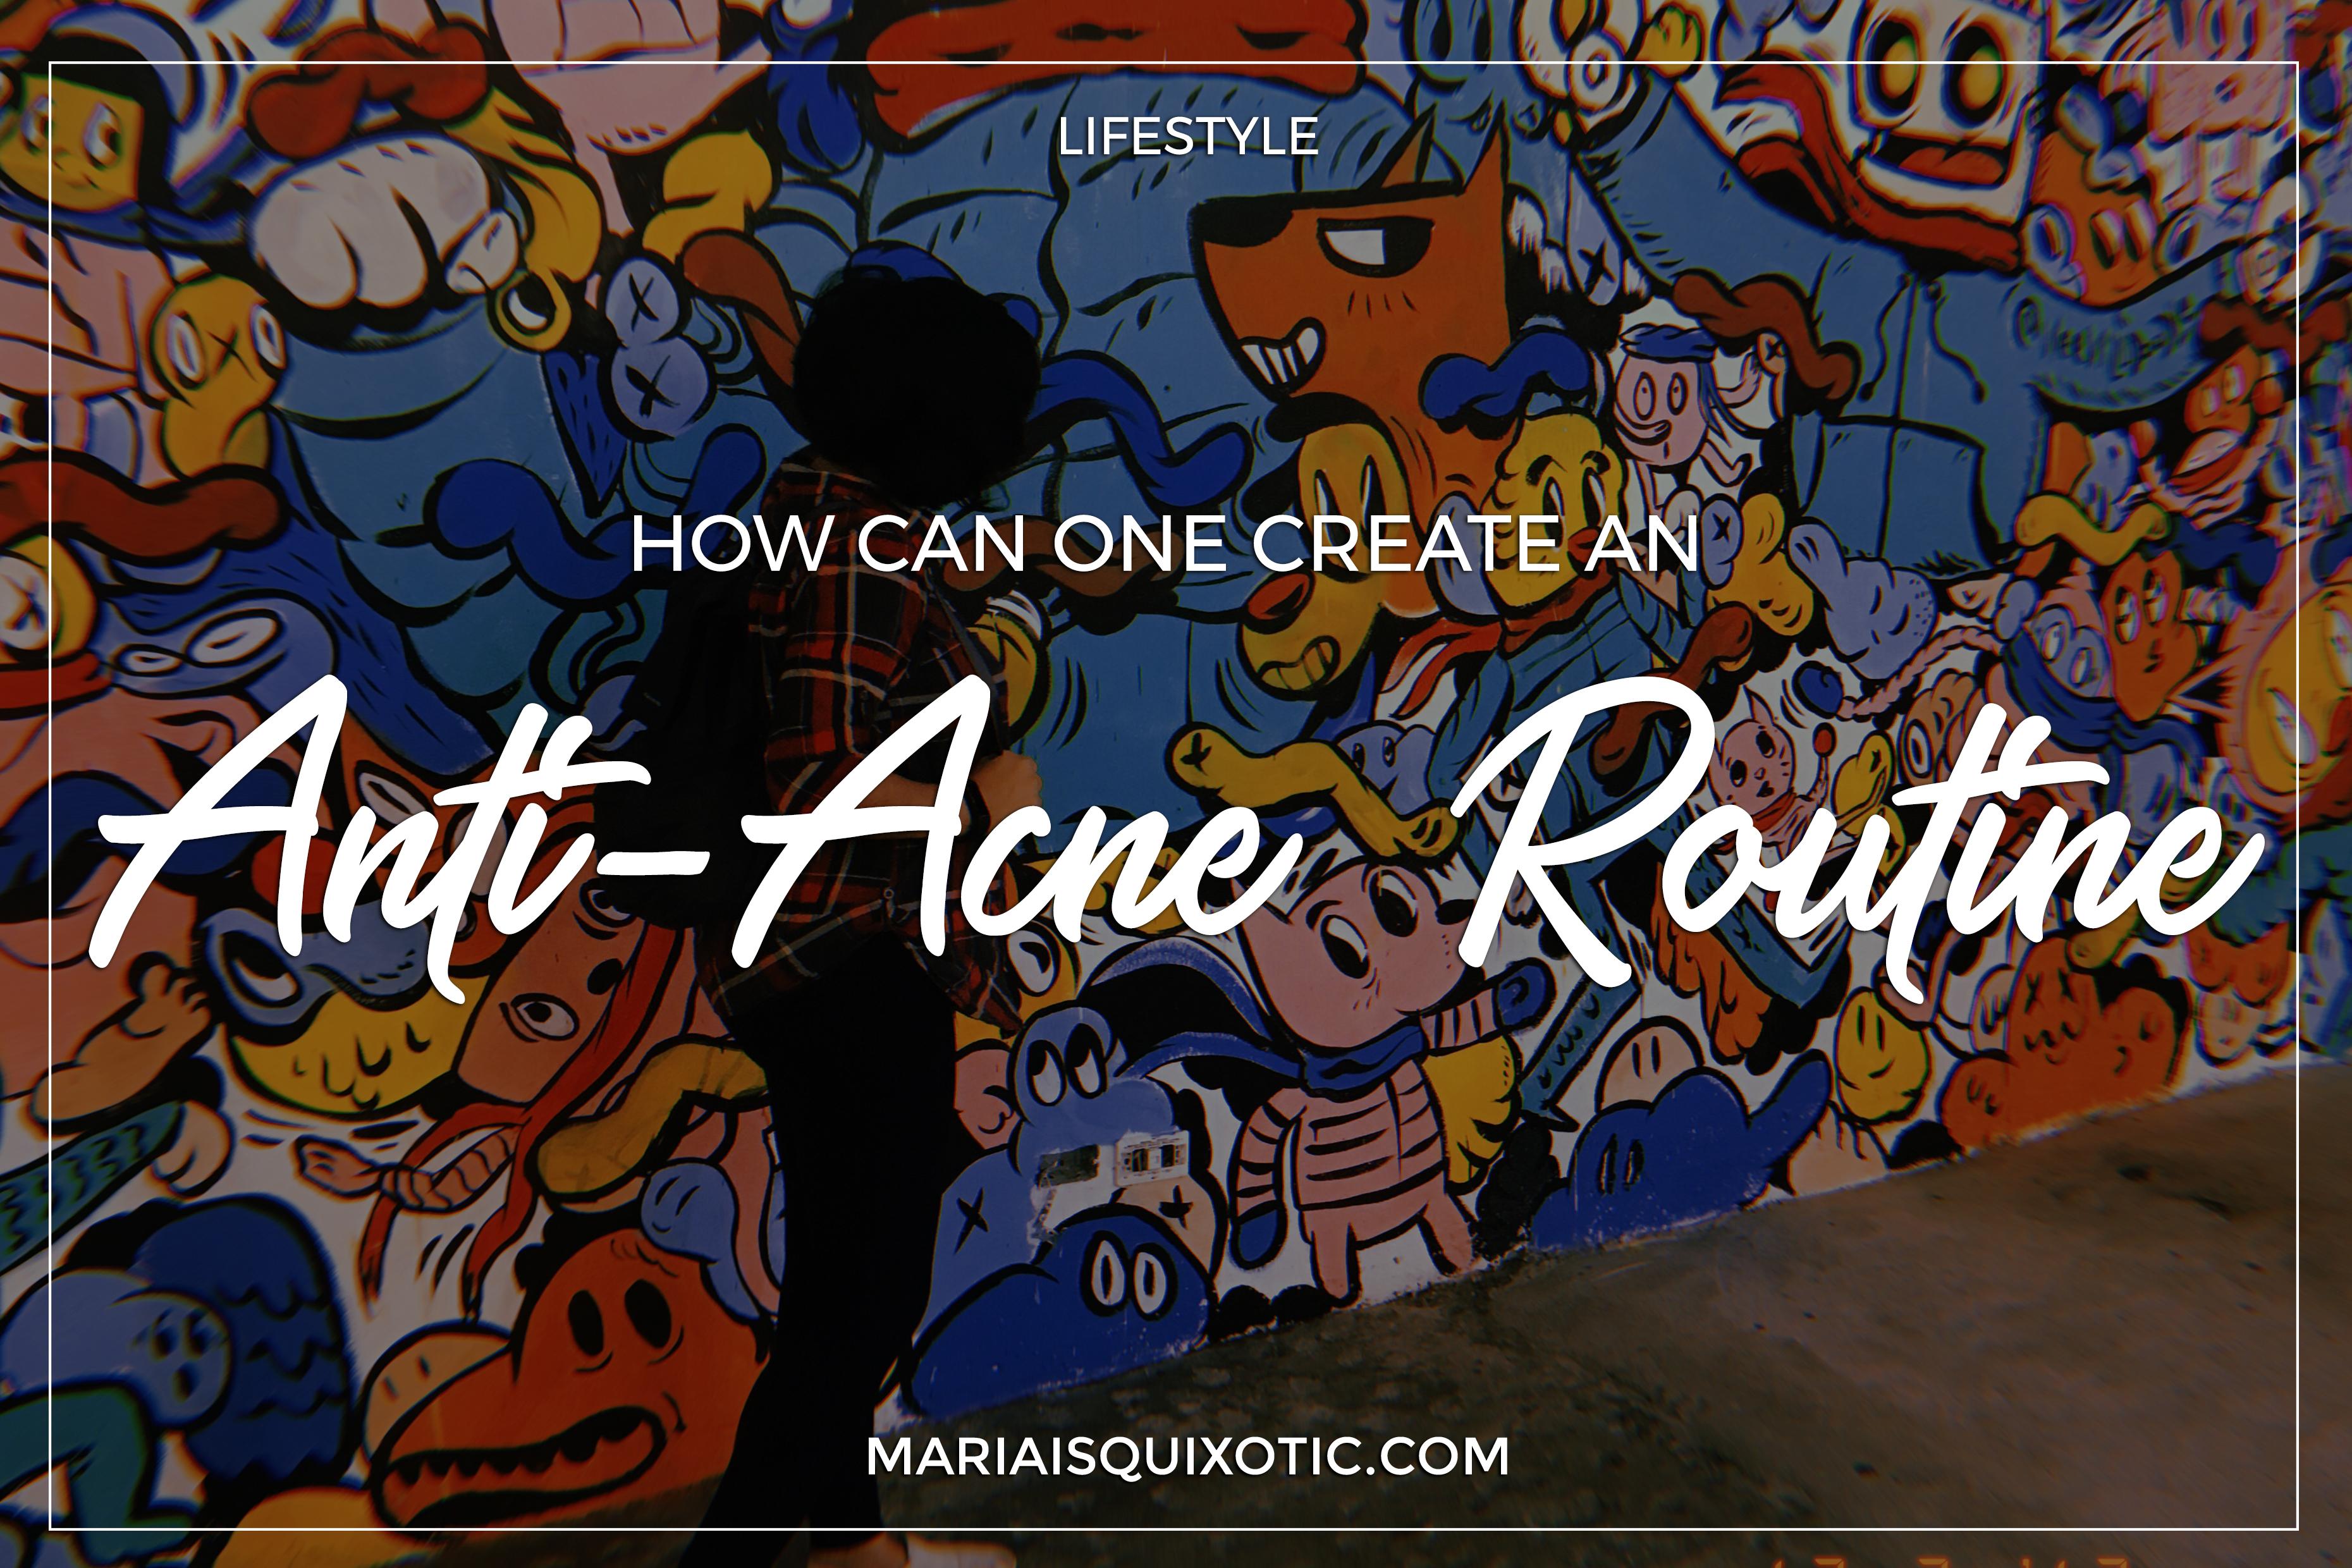 How Can One Create an Anti-Acne Routine